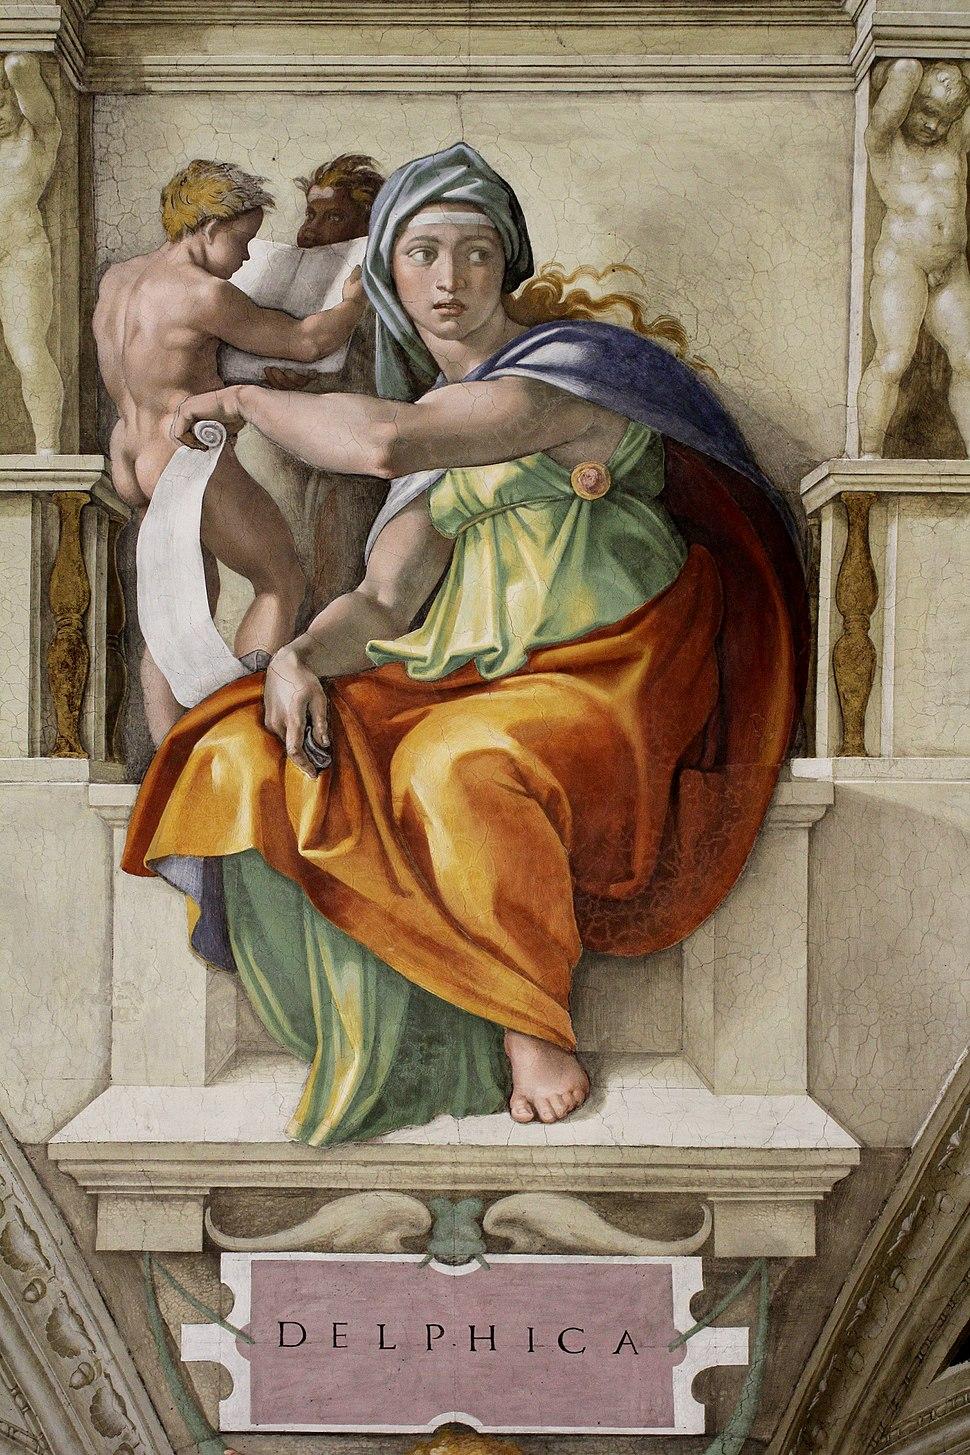 'Delphic Sibyl Sistine Chapel ceiling' by Michelangelo JBU37